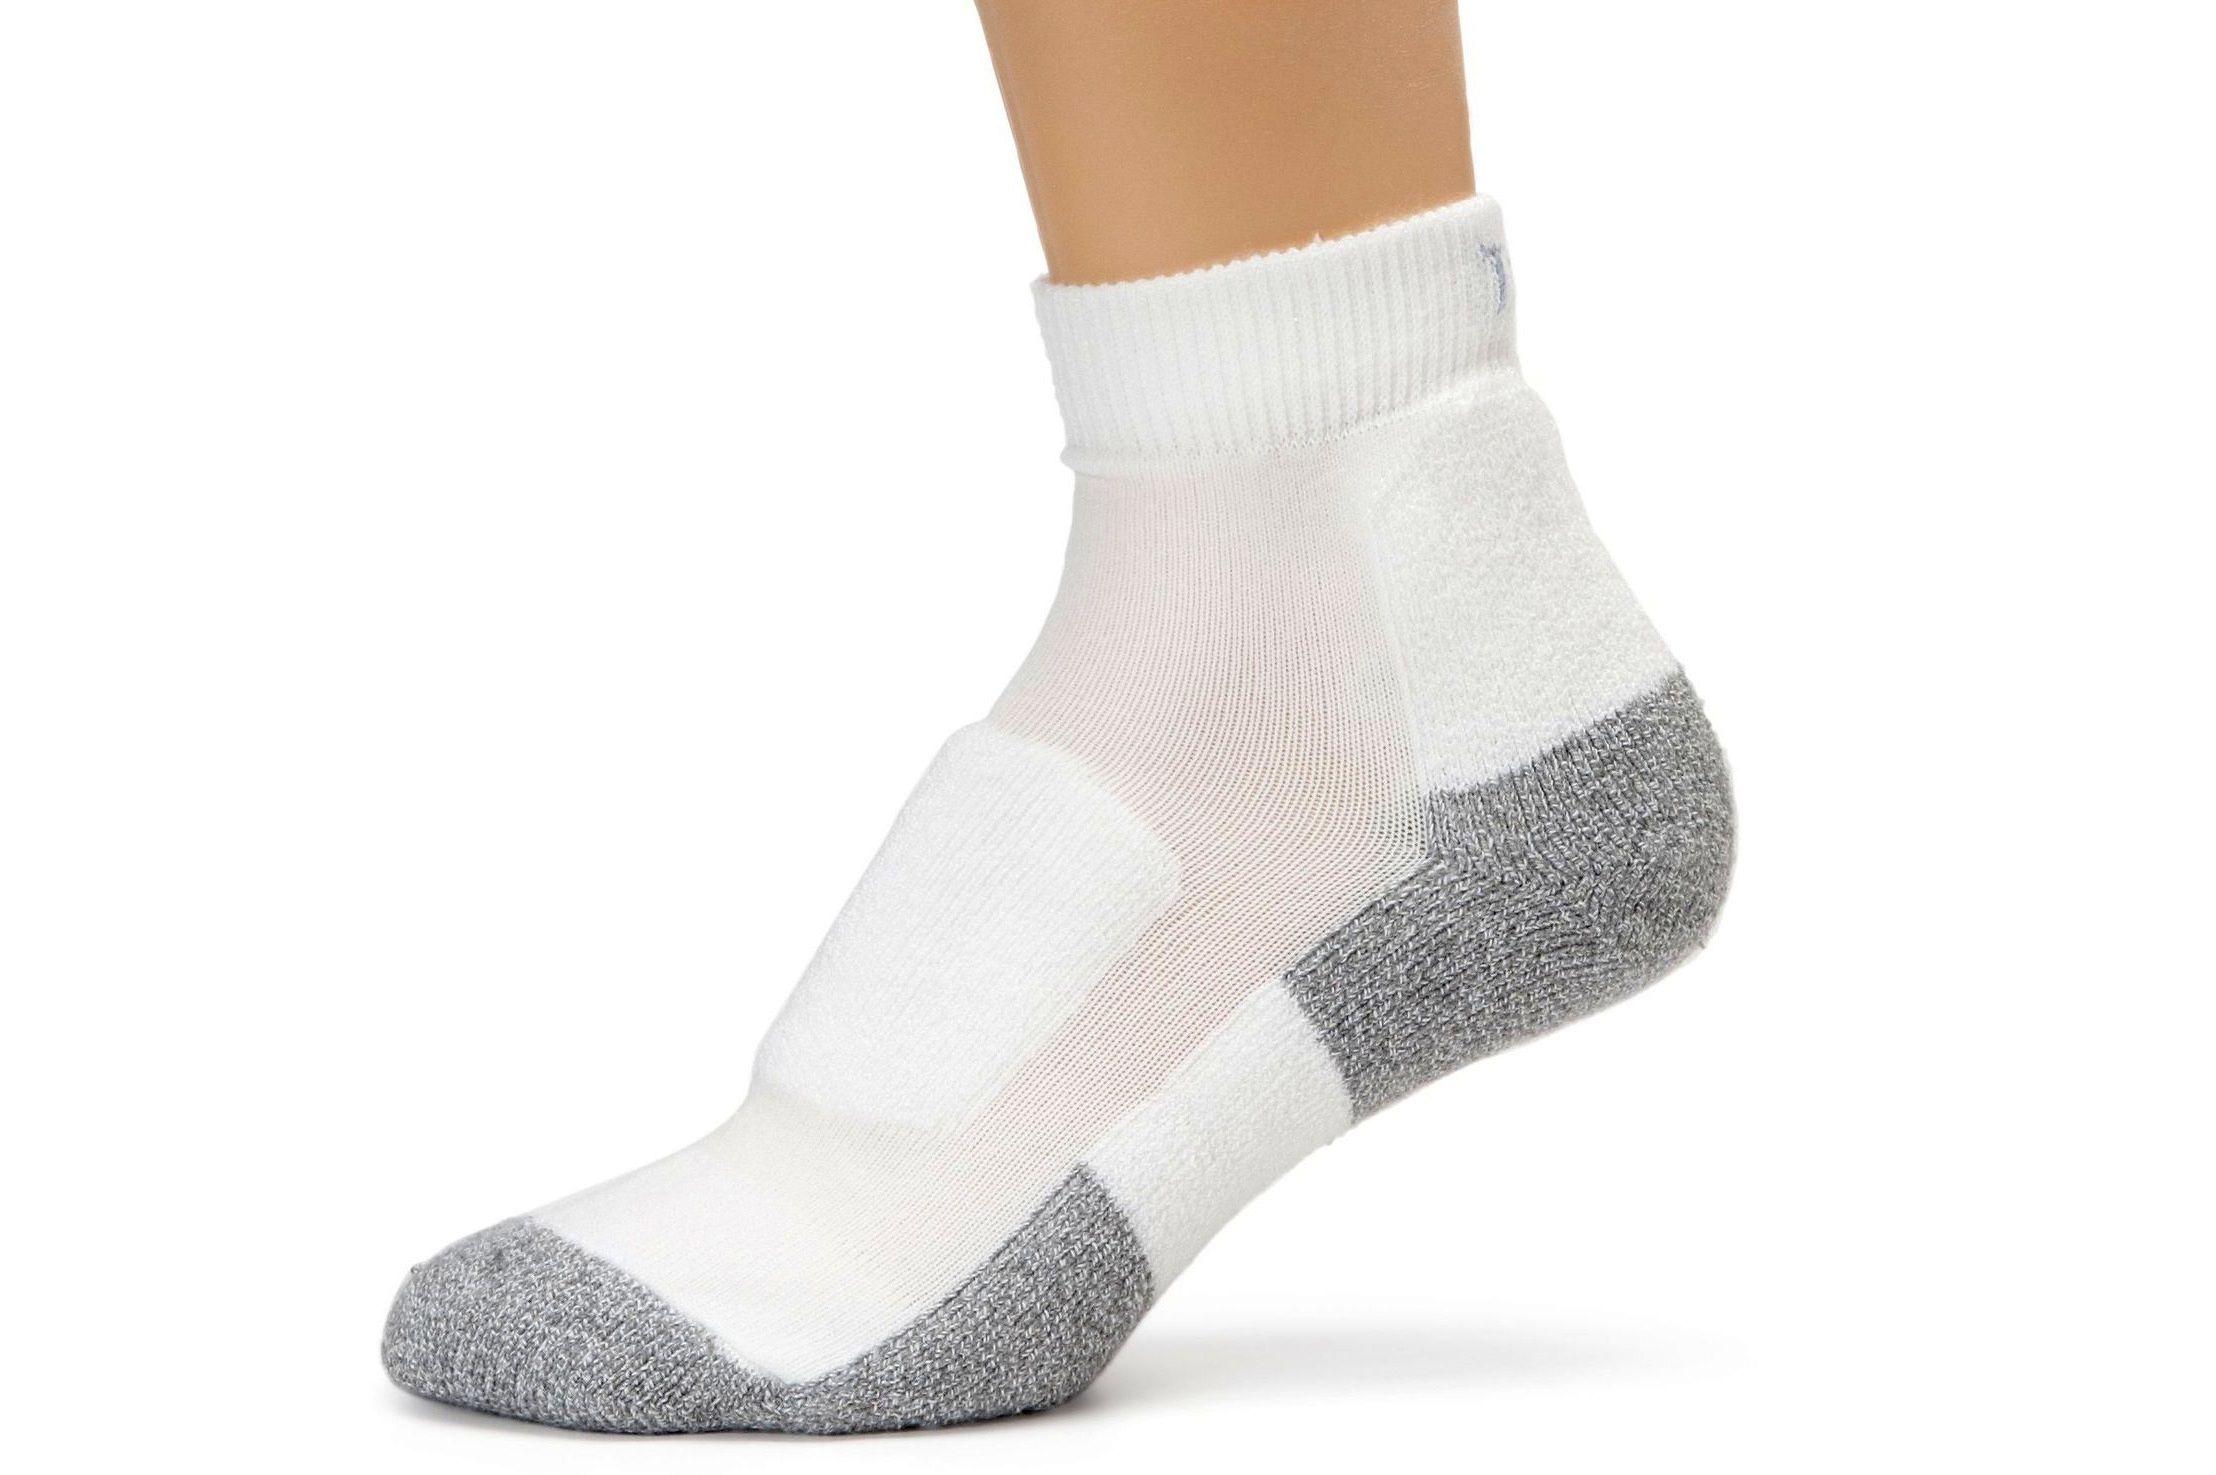 The 7 Best Thorlo Socks To Buy In 2019